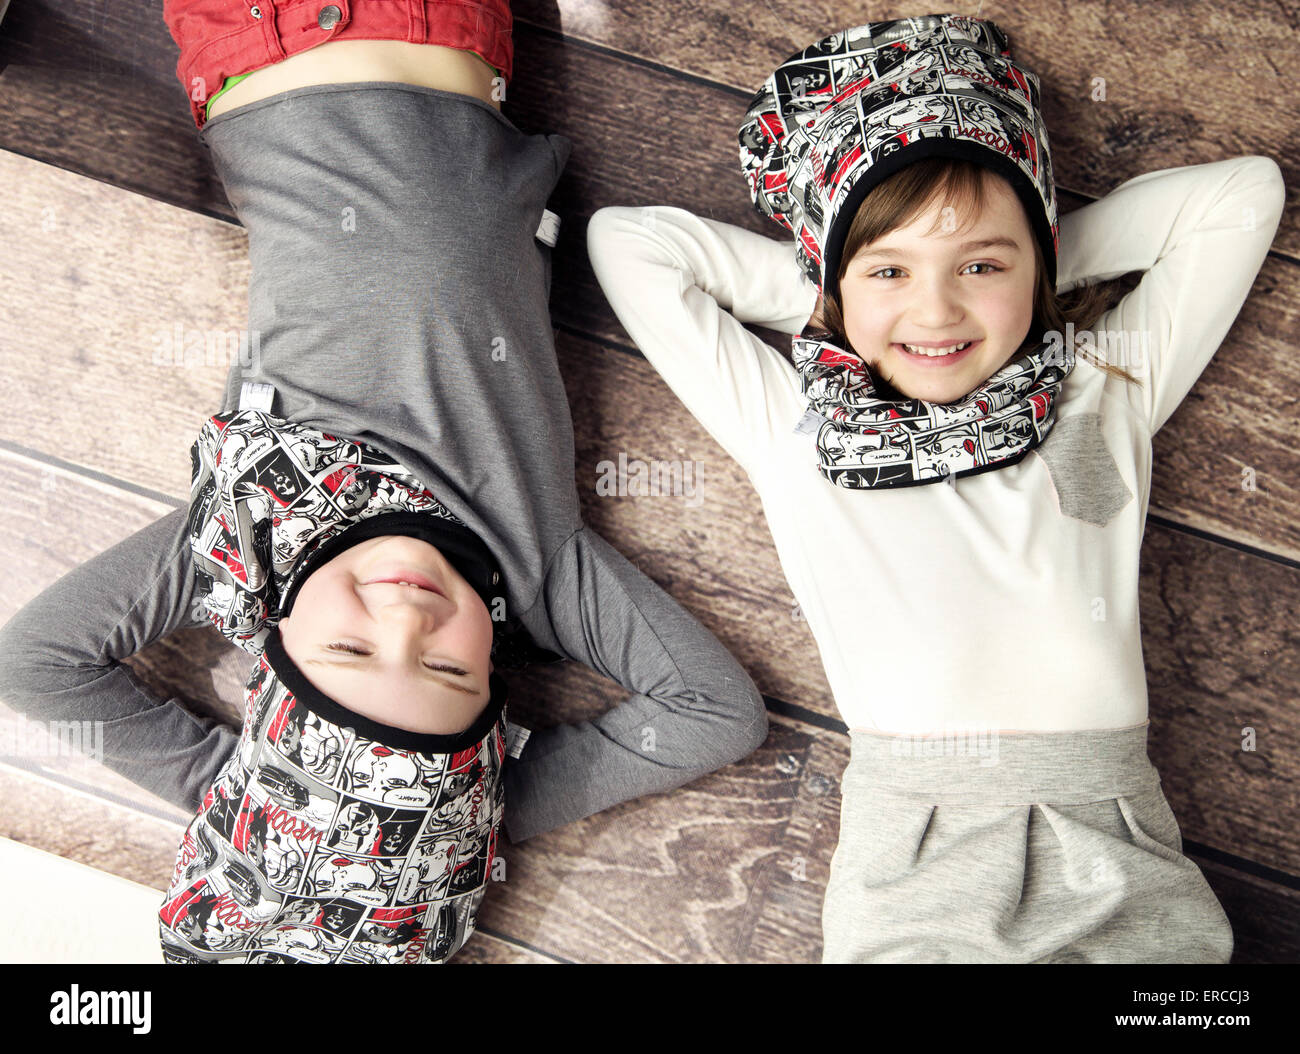 Cheerful kids lying on the wooden floor - Stock Image